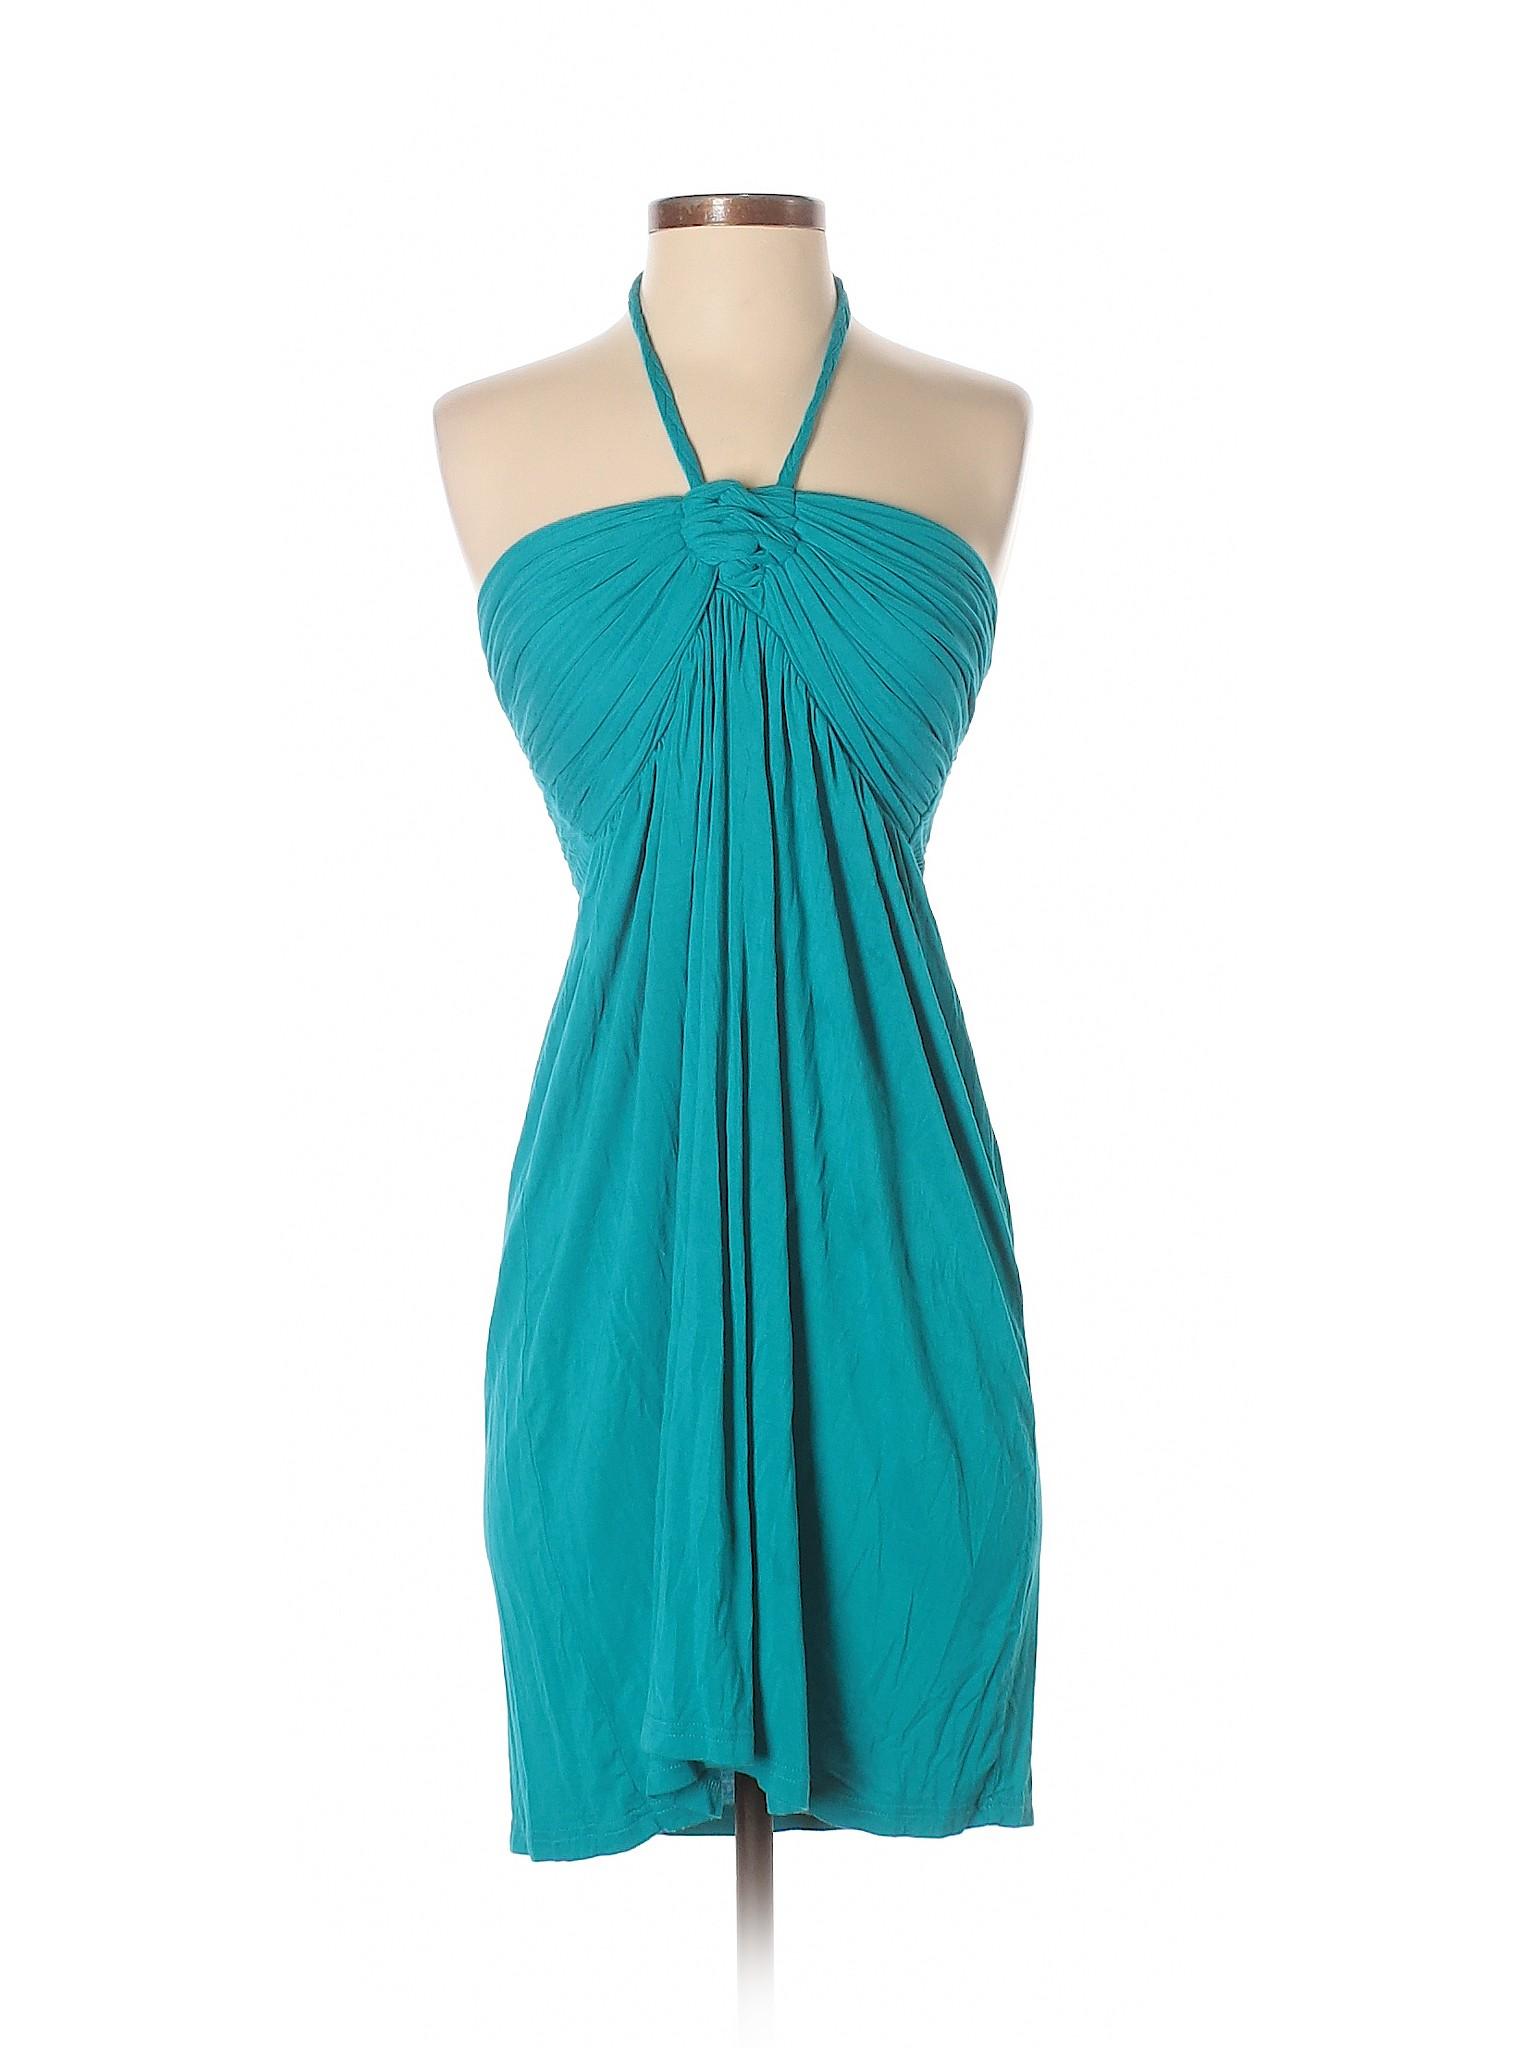 Catwalk Studio Womens Clothing On Up To Off Retail Thredup Jpg 1536x2048 Dresses